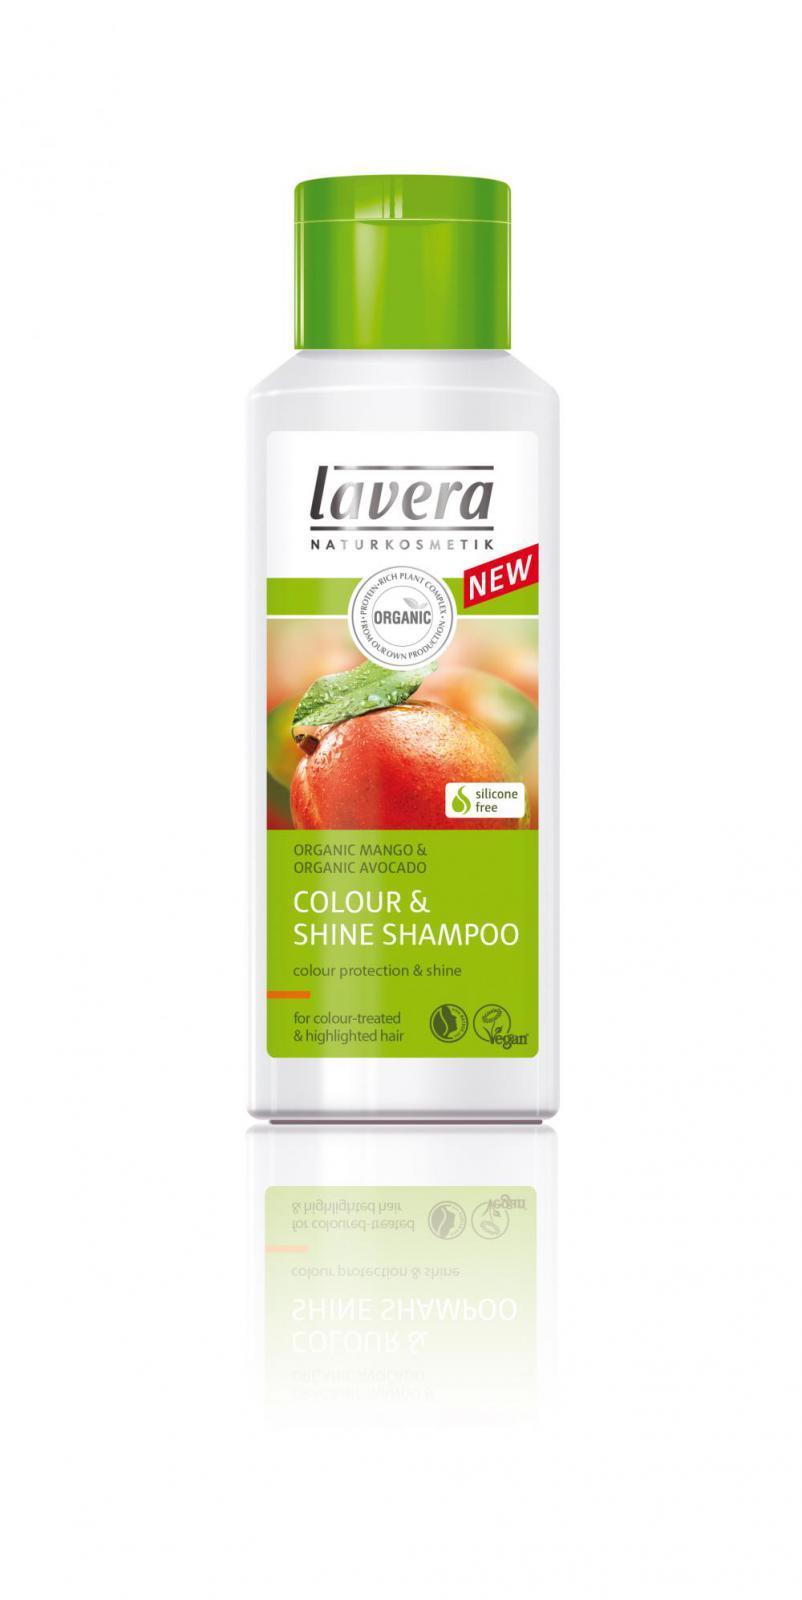 Sampon Natural Pentru Par Vopsit Lavera - 200 Ml